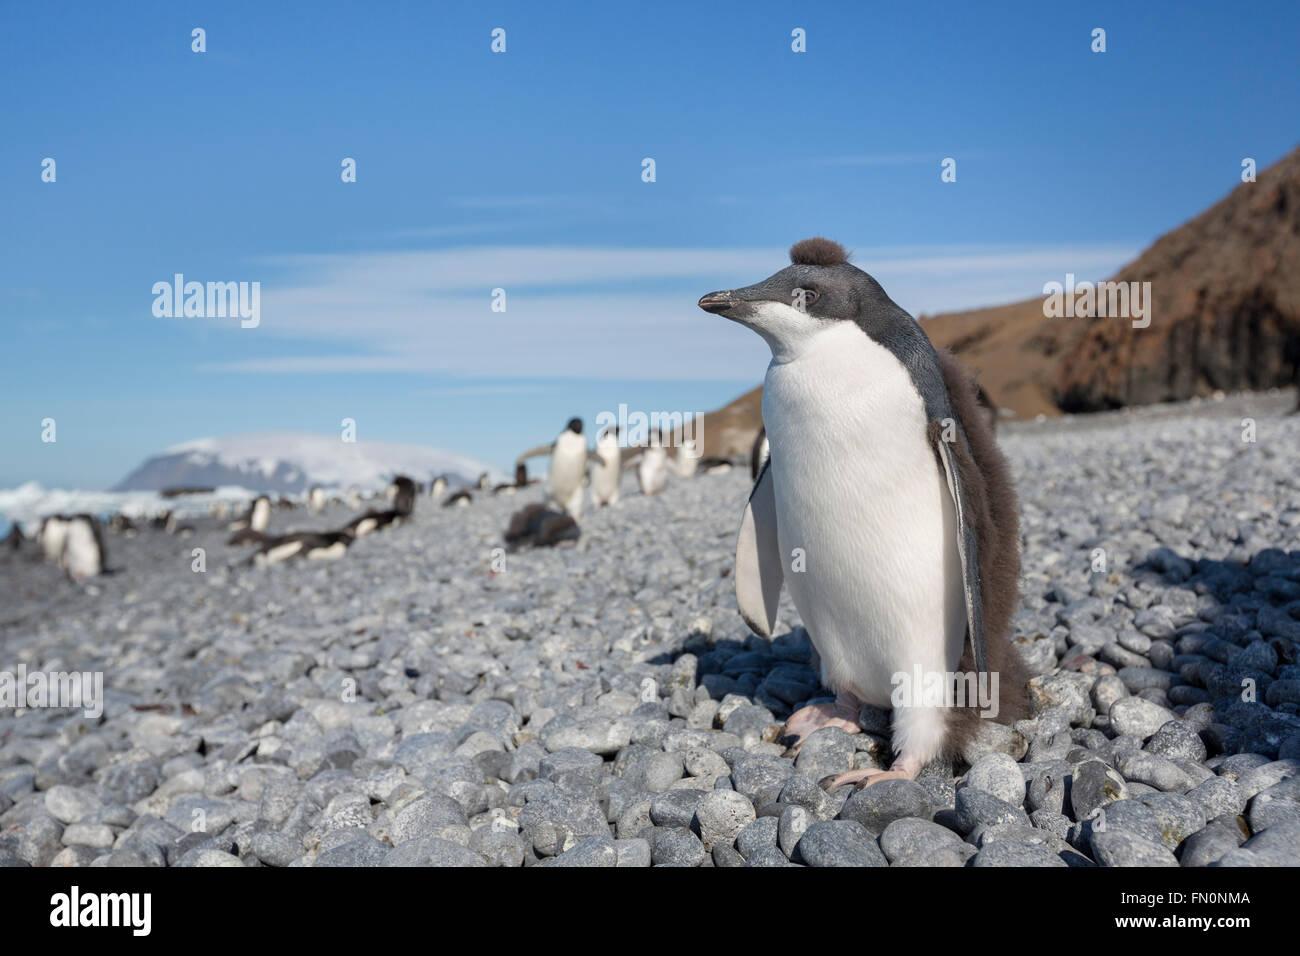 Antarctica, Antarctic peninsula, Brown Bluff. Adelie penguin, chick - Stock Image